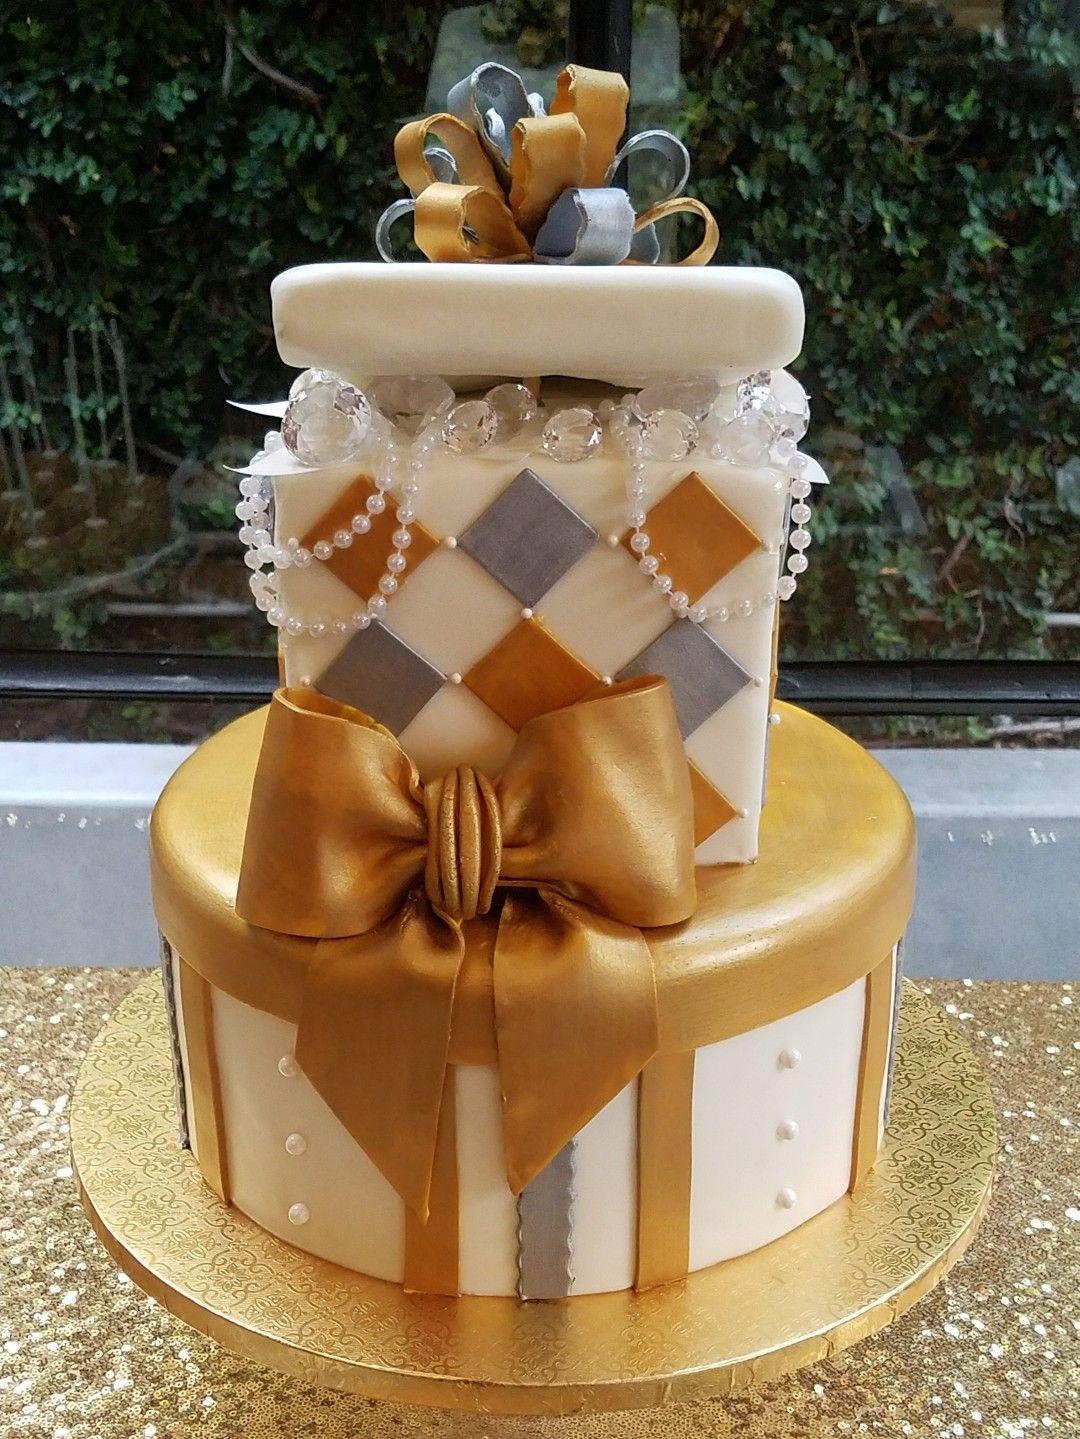 Gift Boxshaped Cake 50 Years and Blessed Theme Birthday